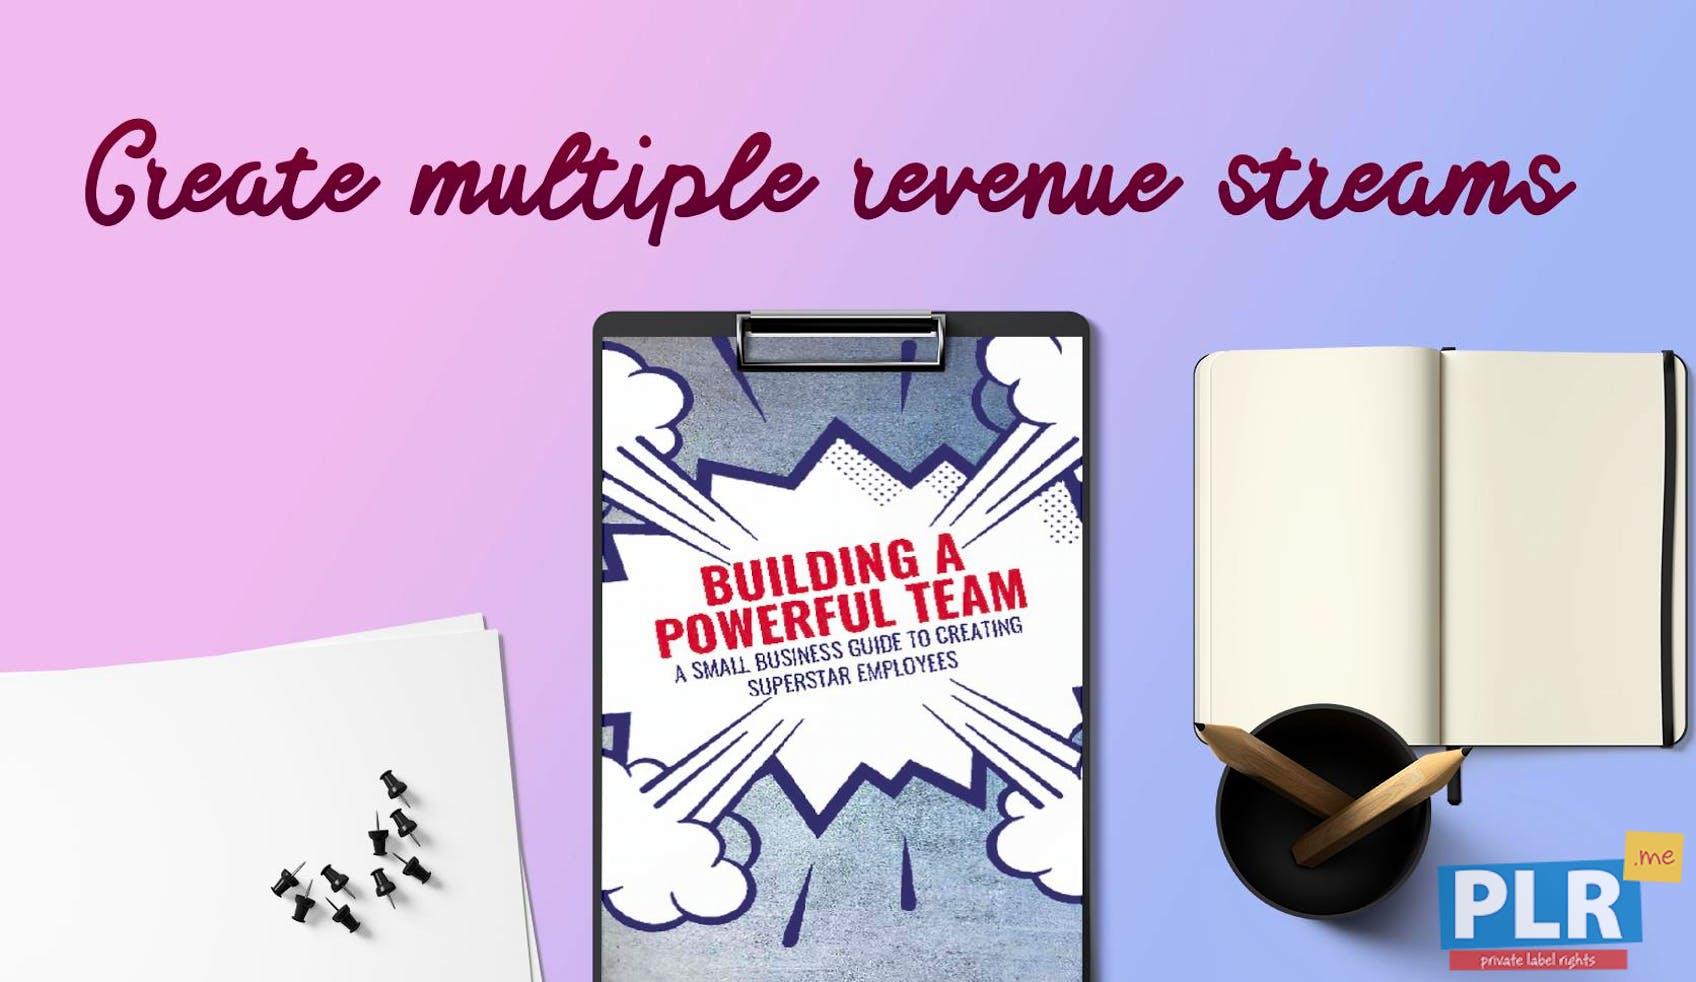 Building A Powerful Team